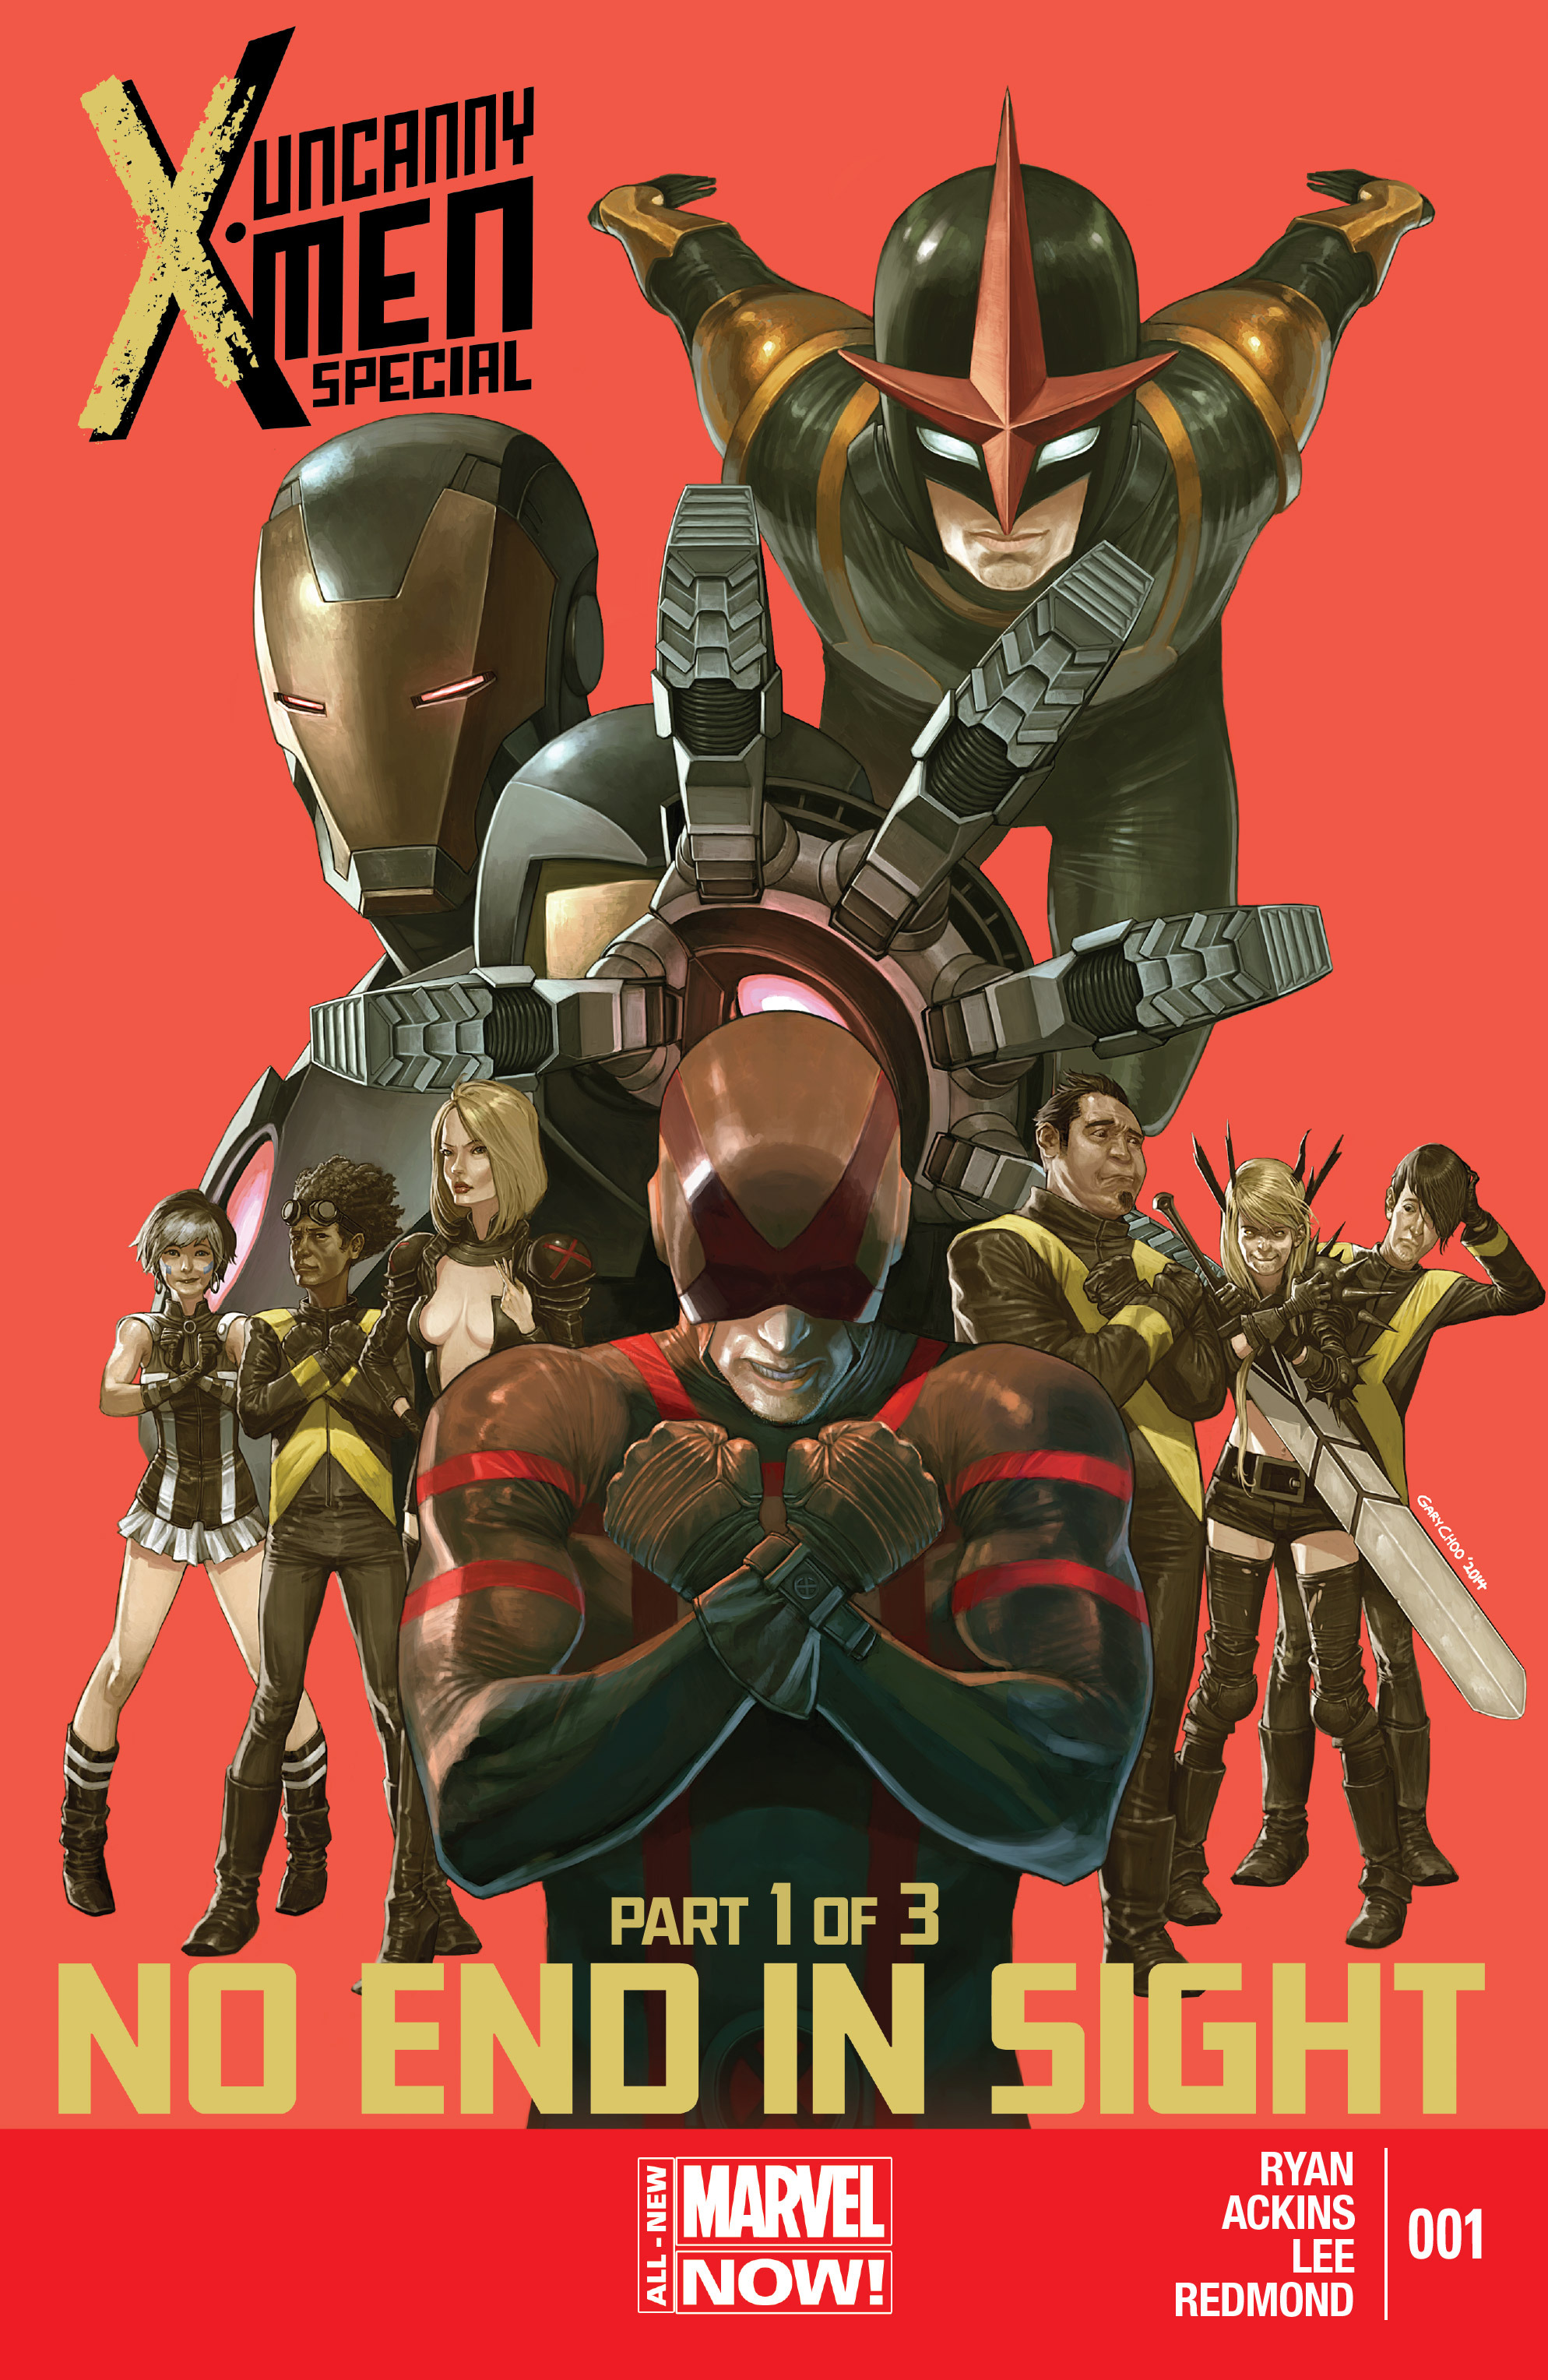 Read online Uncanny X-Men (2013) comic -  Issue # _Special 1 - 1